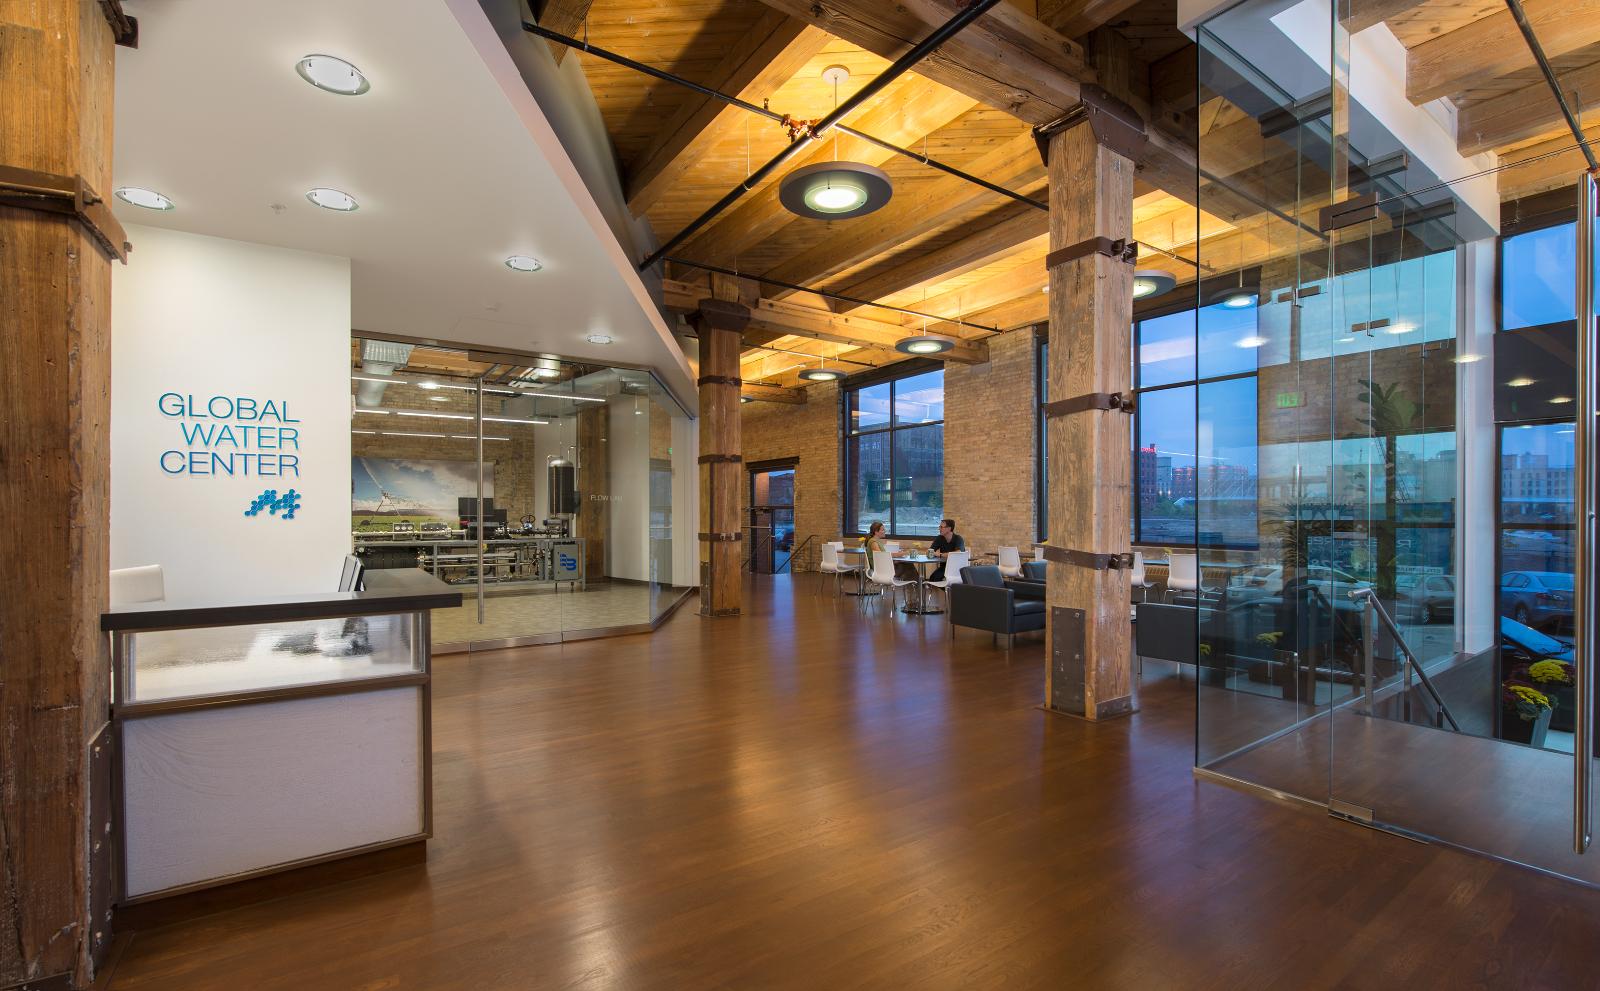 Global Water Center interior